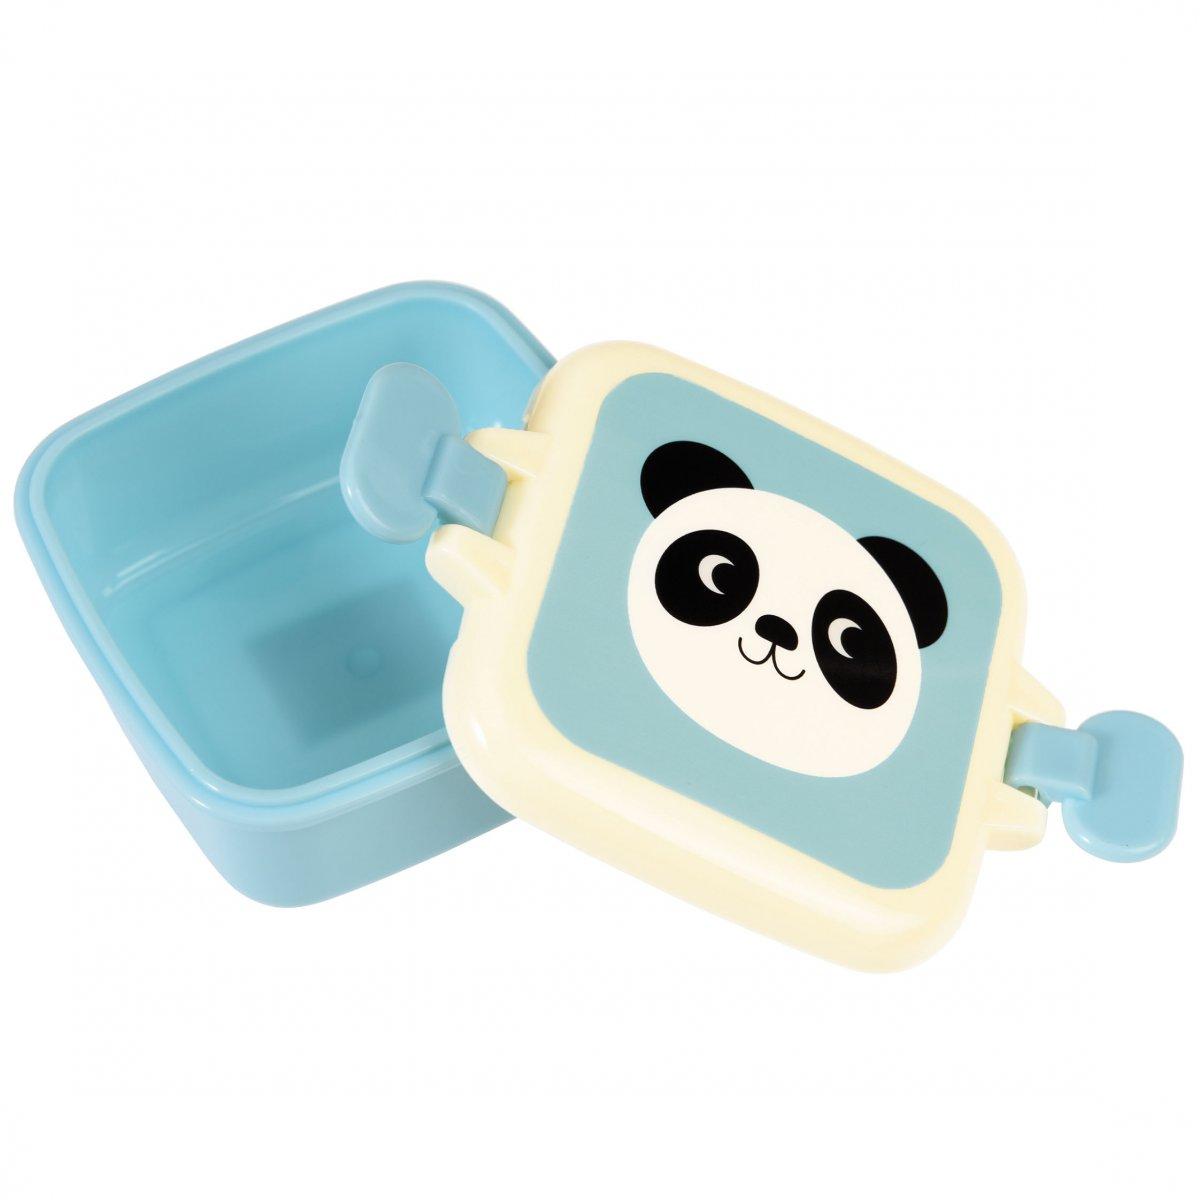 Rex London Mini Saklama Kabı - Panda 1